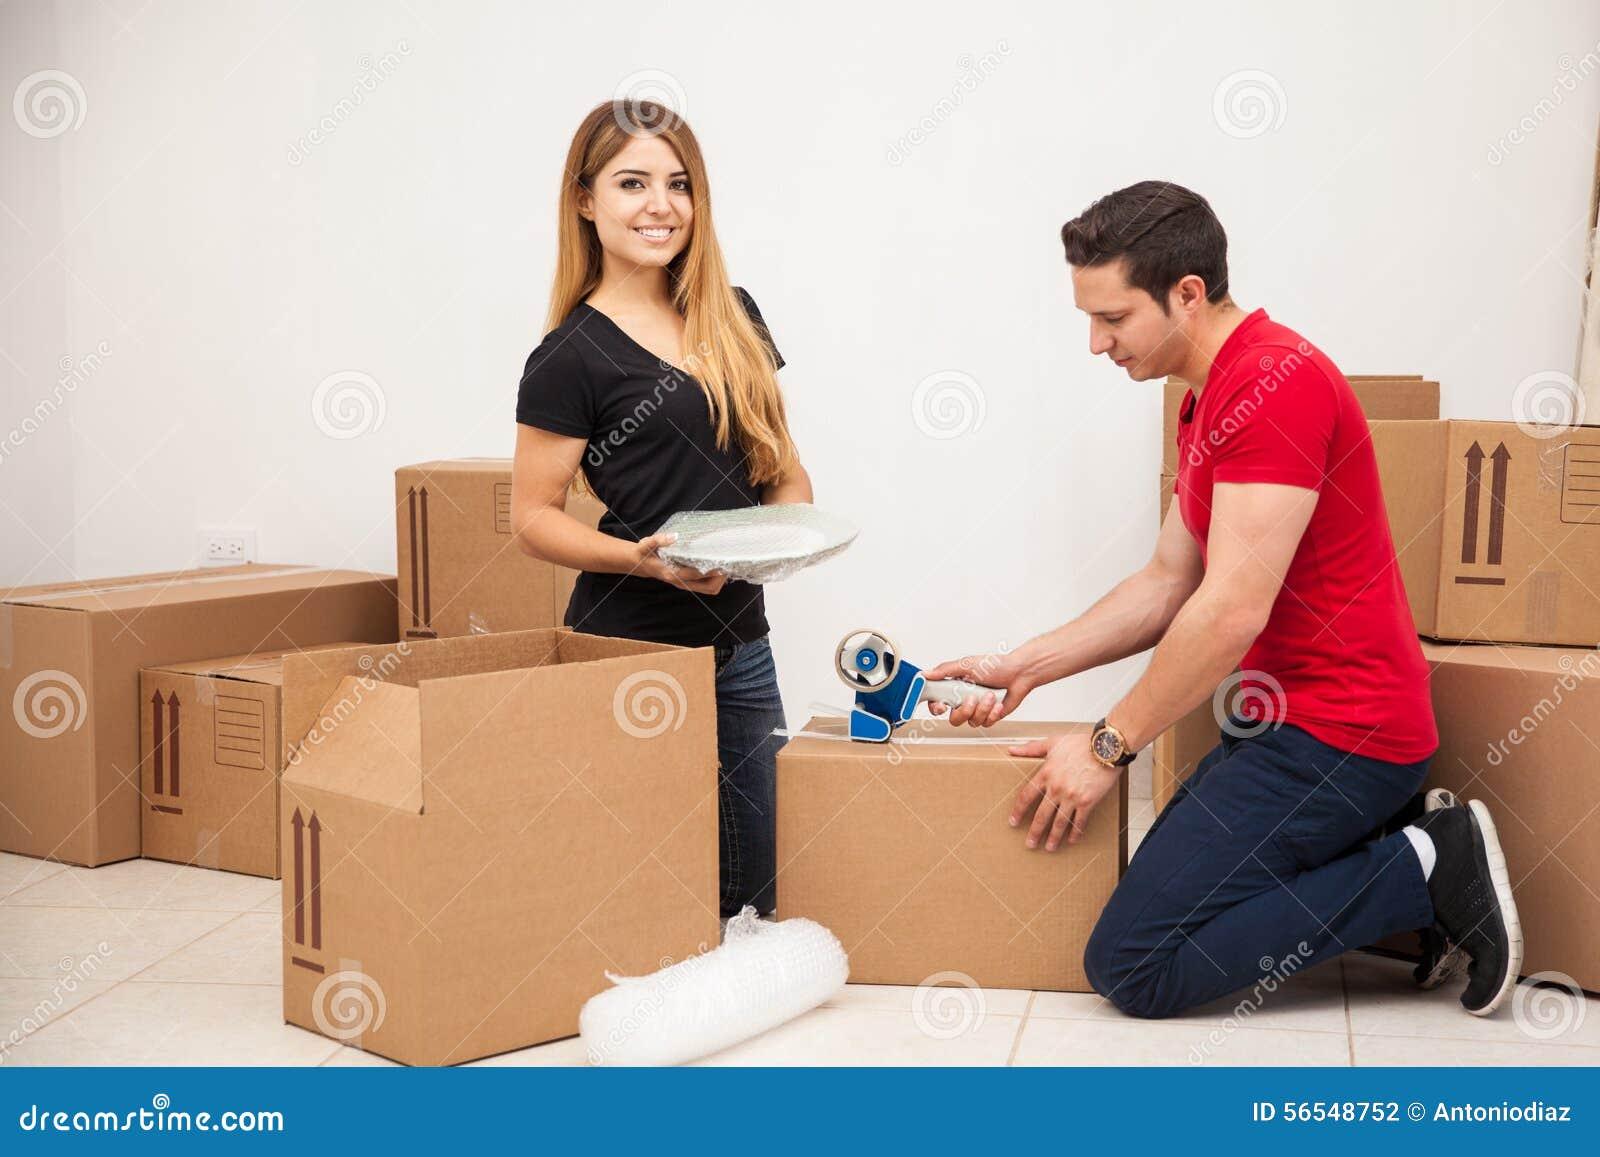 Moving in with my boyfriend quiz